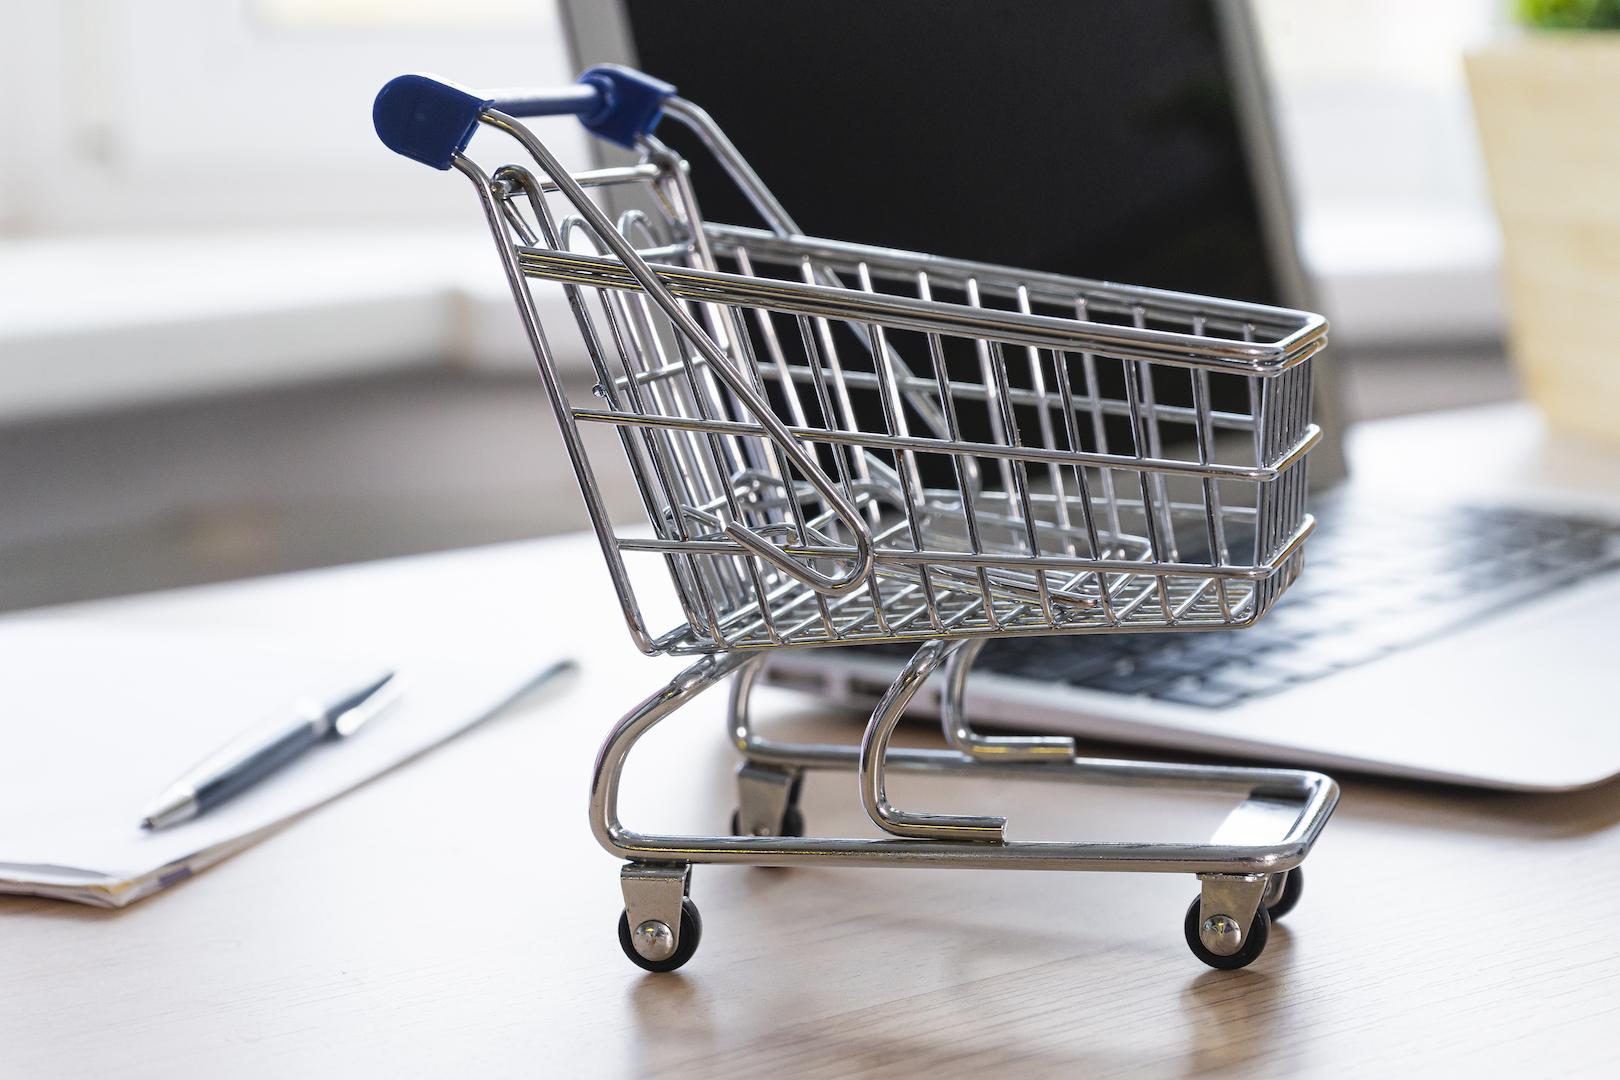 ShopWorn increases portfolio of luxury brands onsite by 50 percent